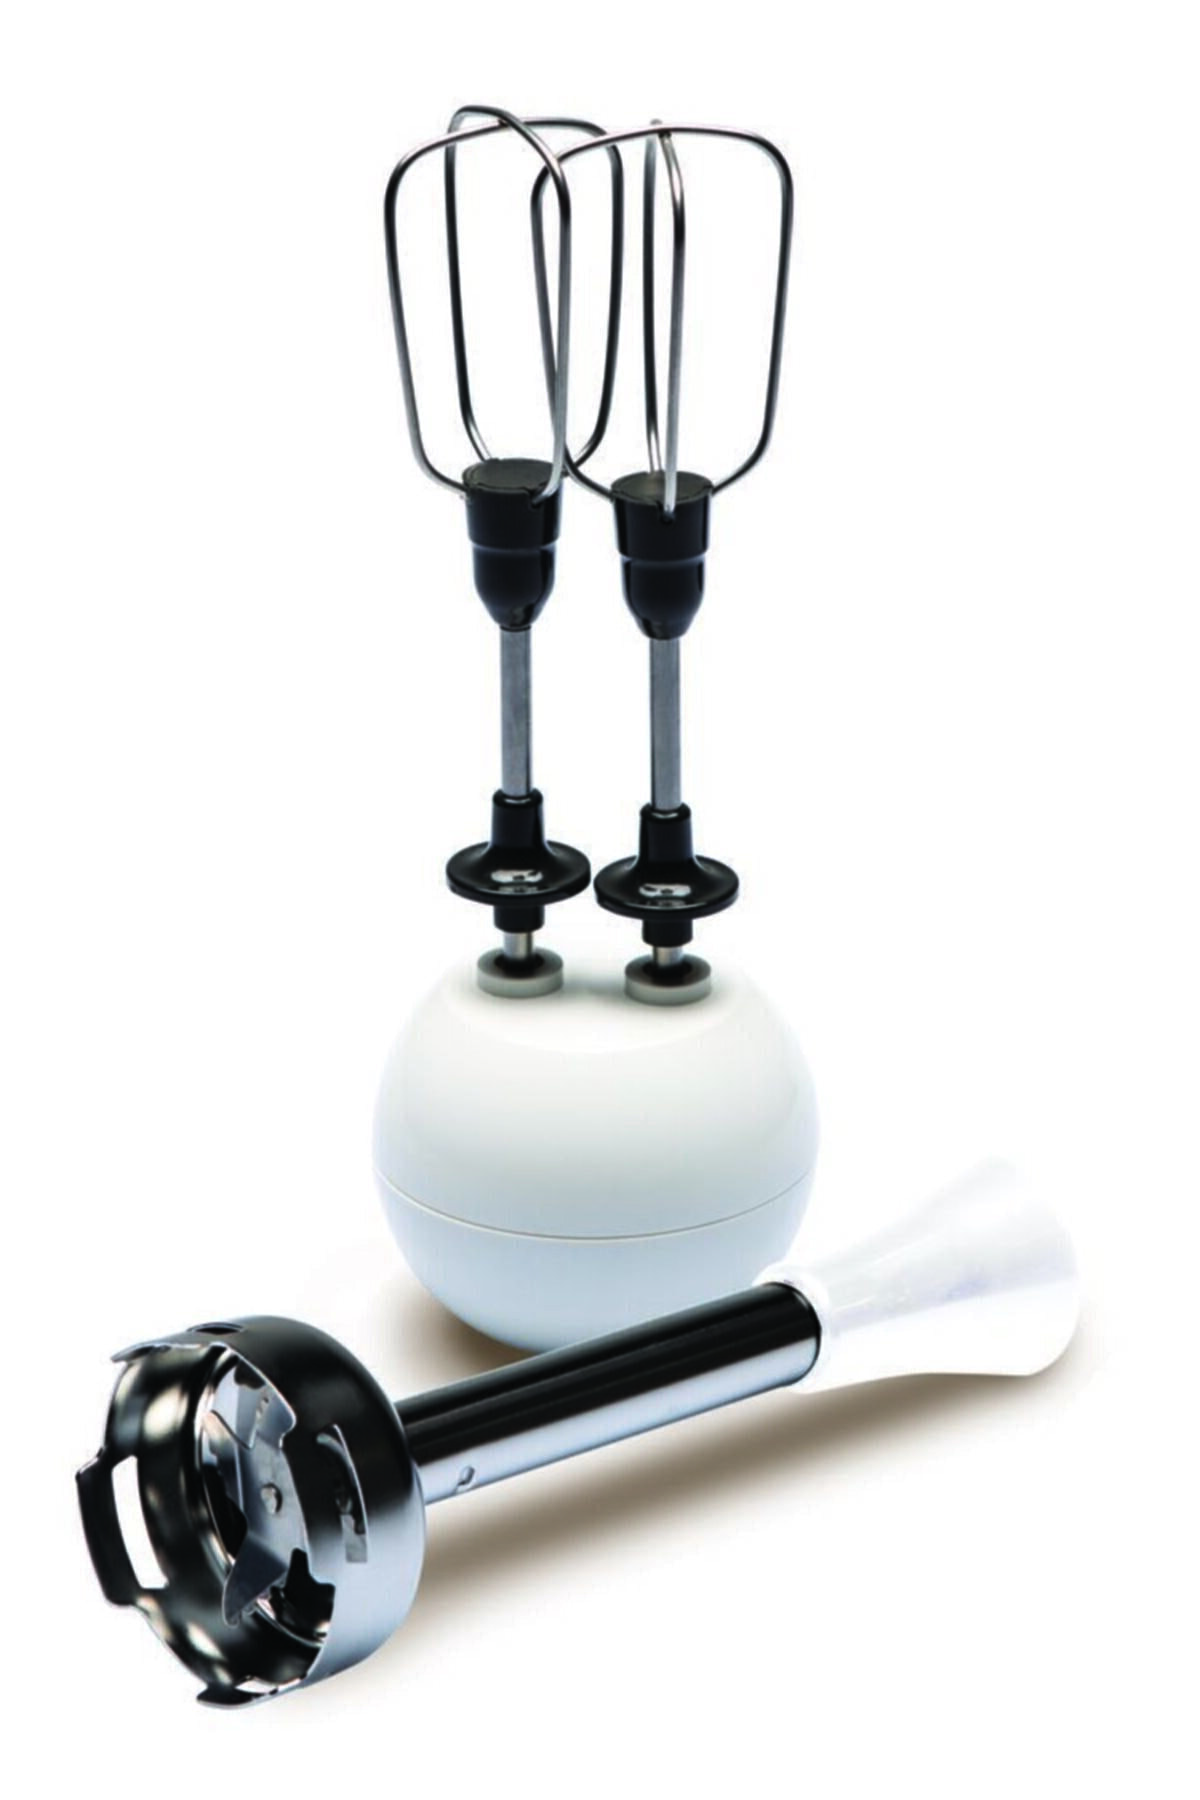 TEFAL Beyaz Easyblend El Blender Seti 1000w 0.7 Litre 2